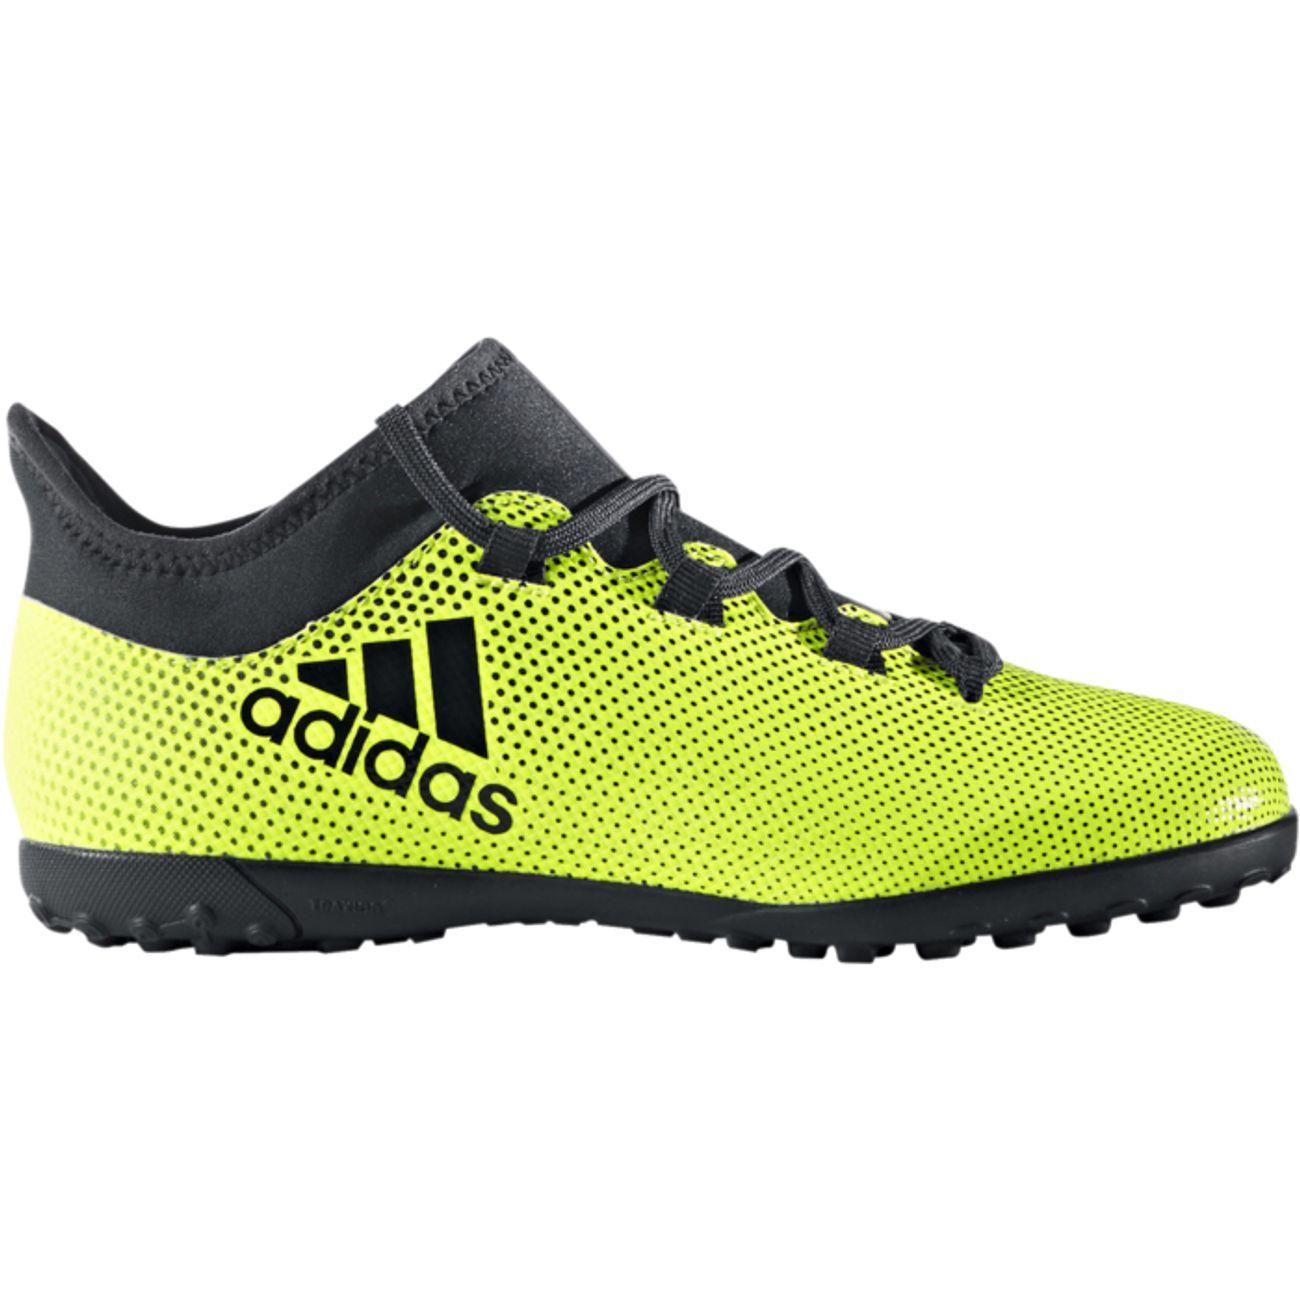 Chaussures Futsal,Terrain Synthétique achat pas cher GO